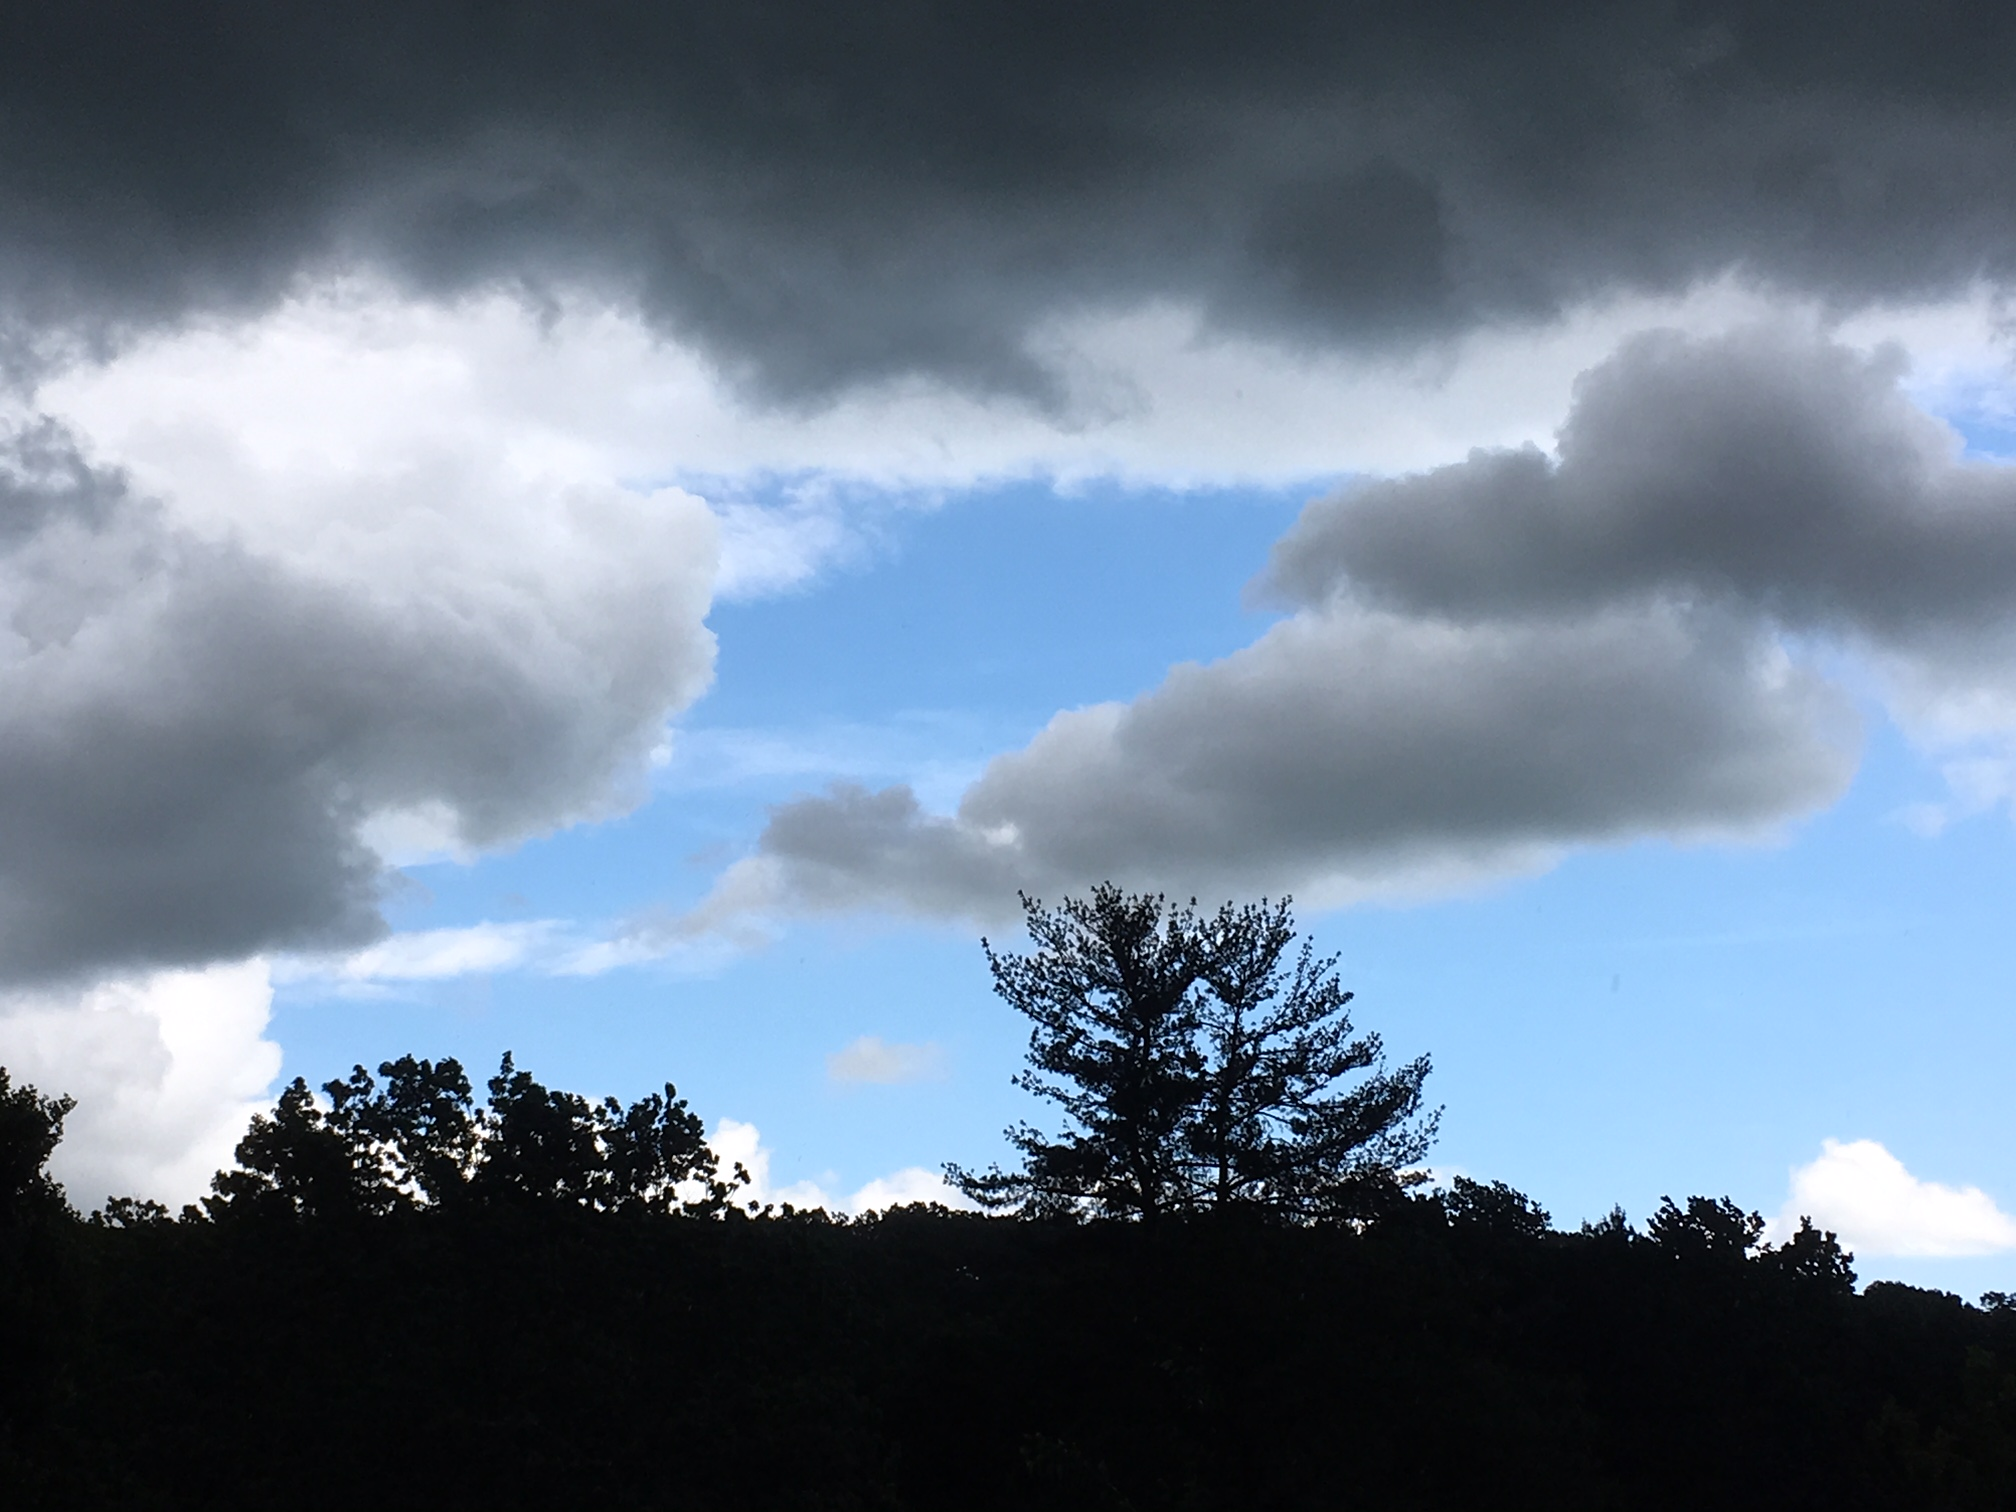 approaching-storm.JPG